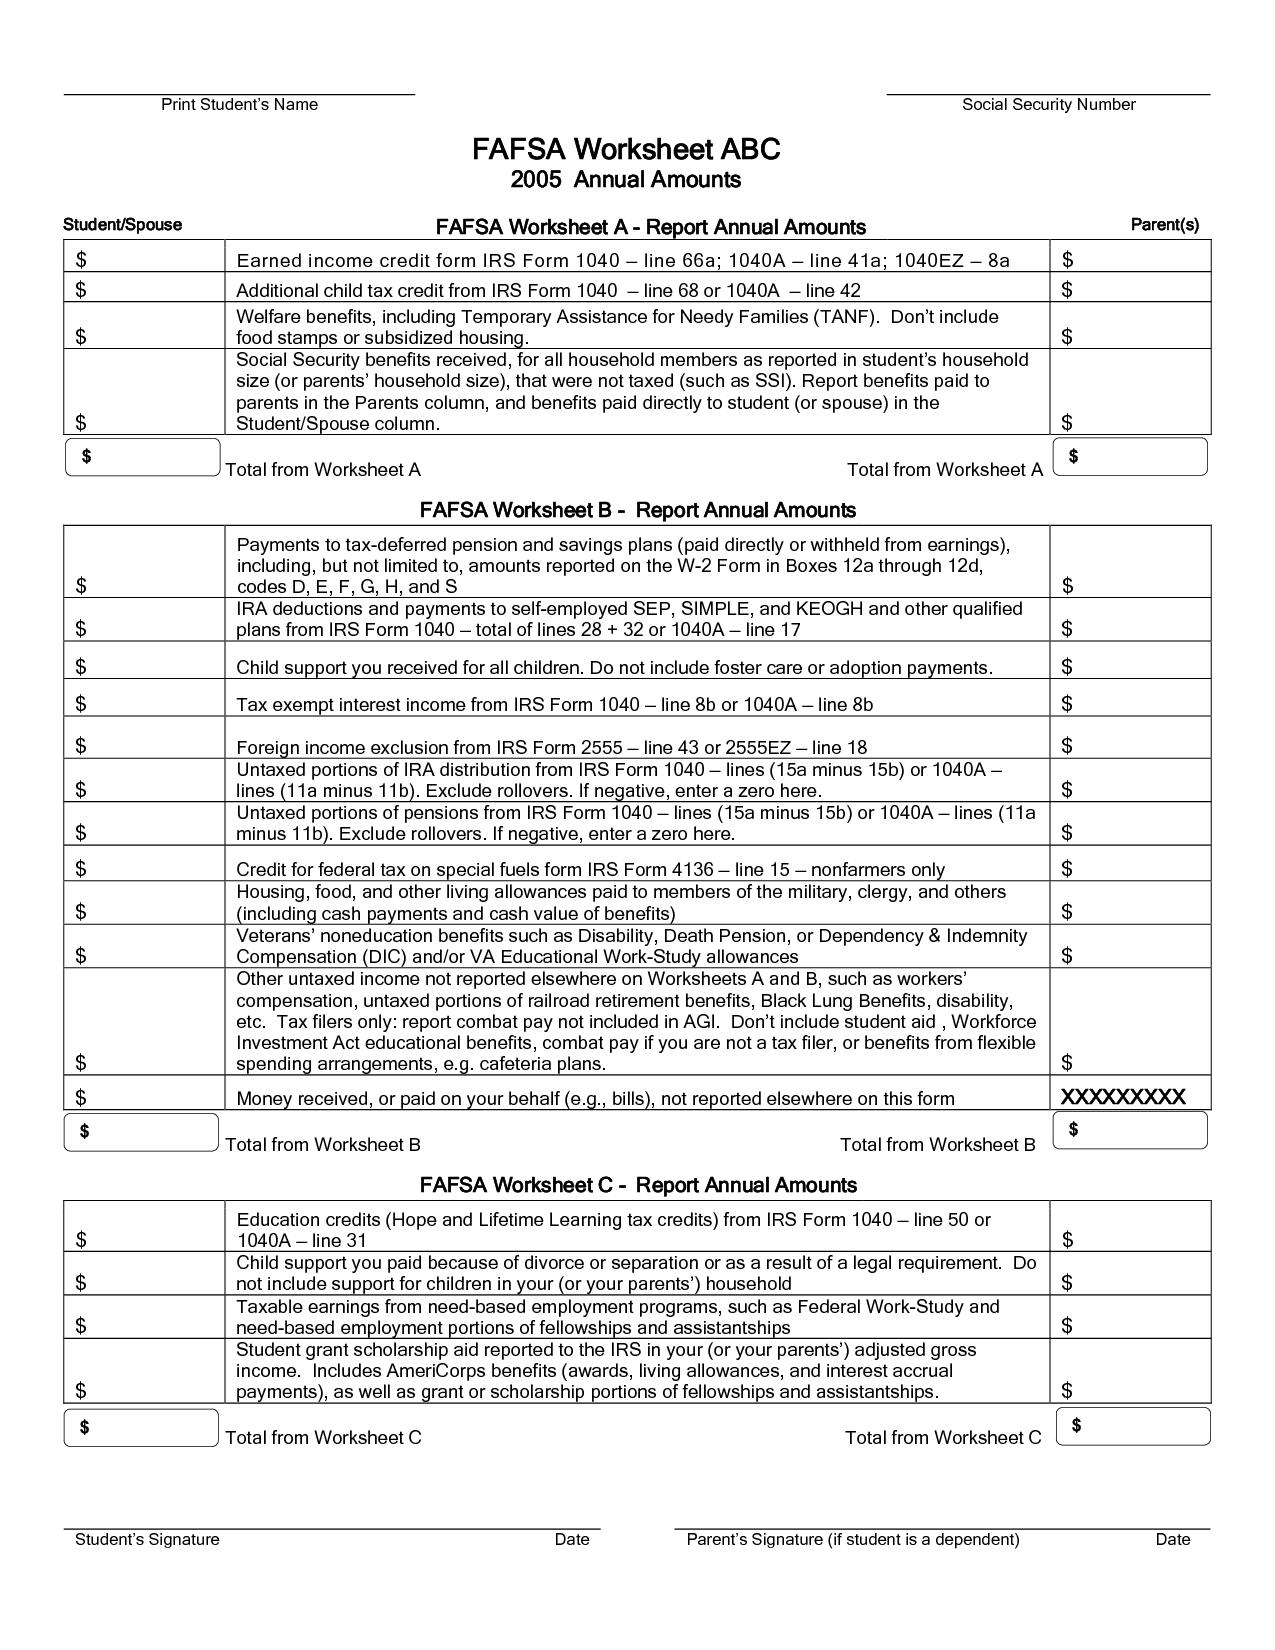 Irs Social Security Worksheet 1